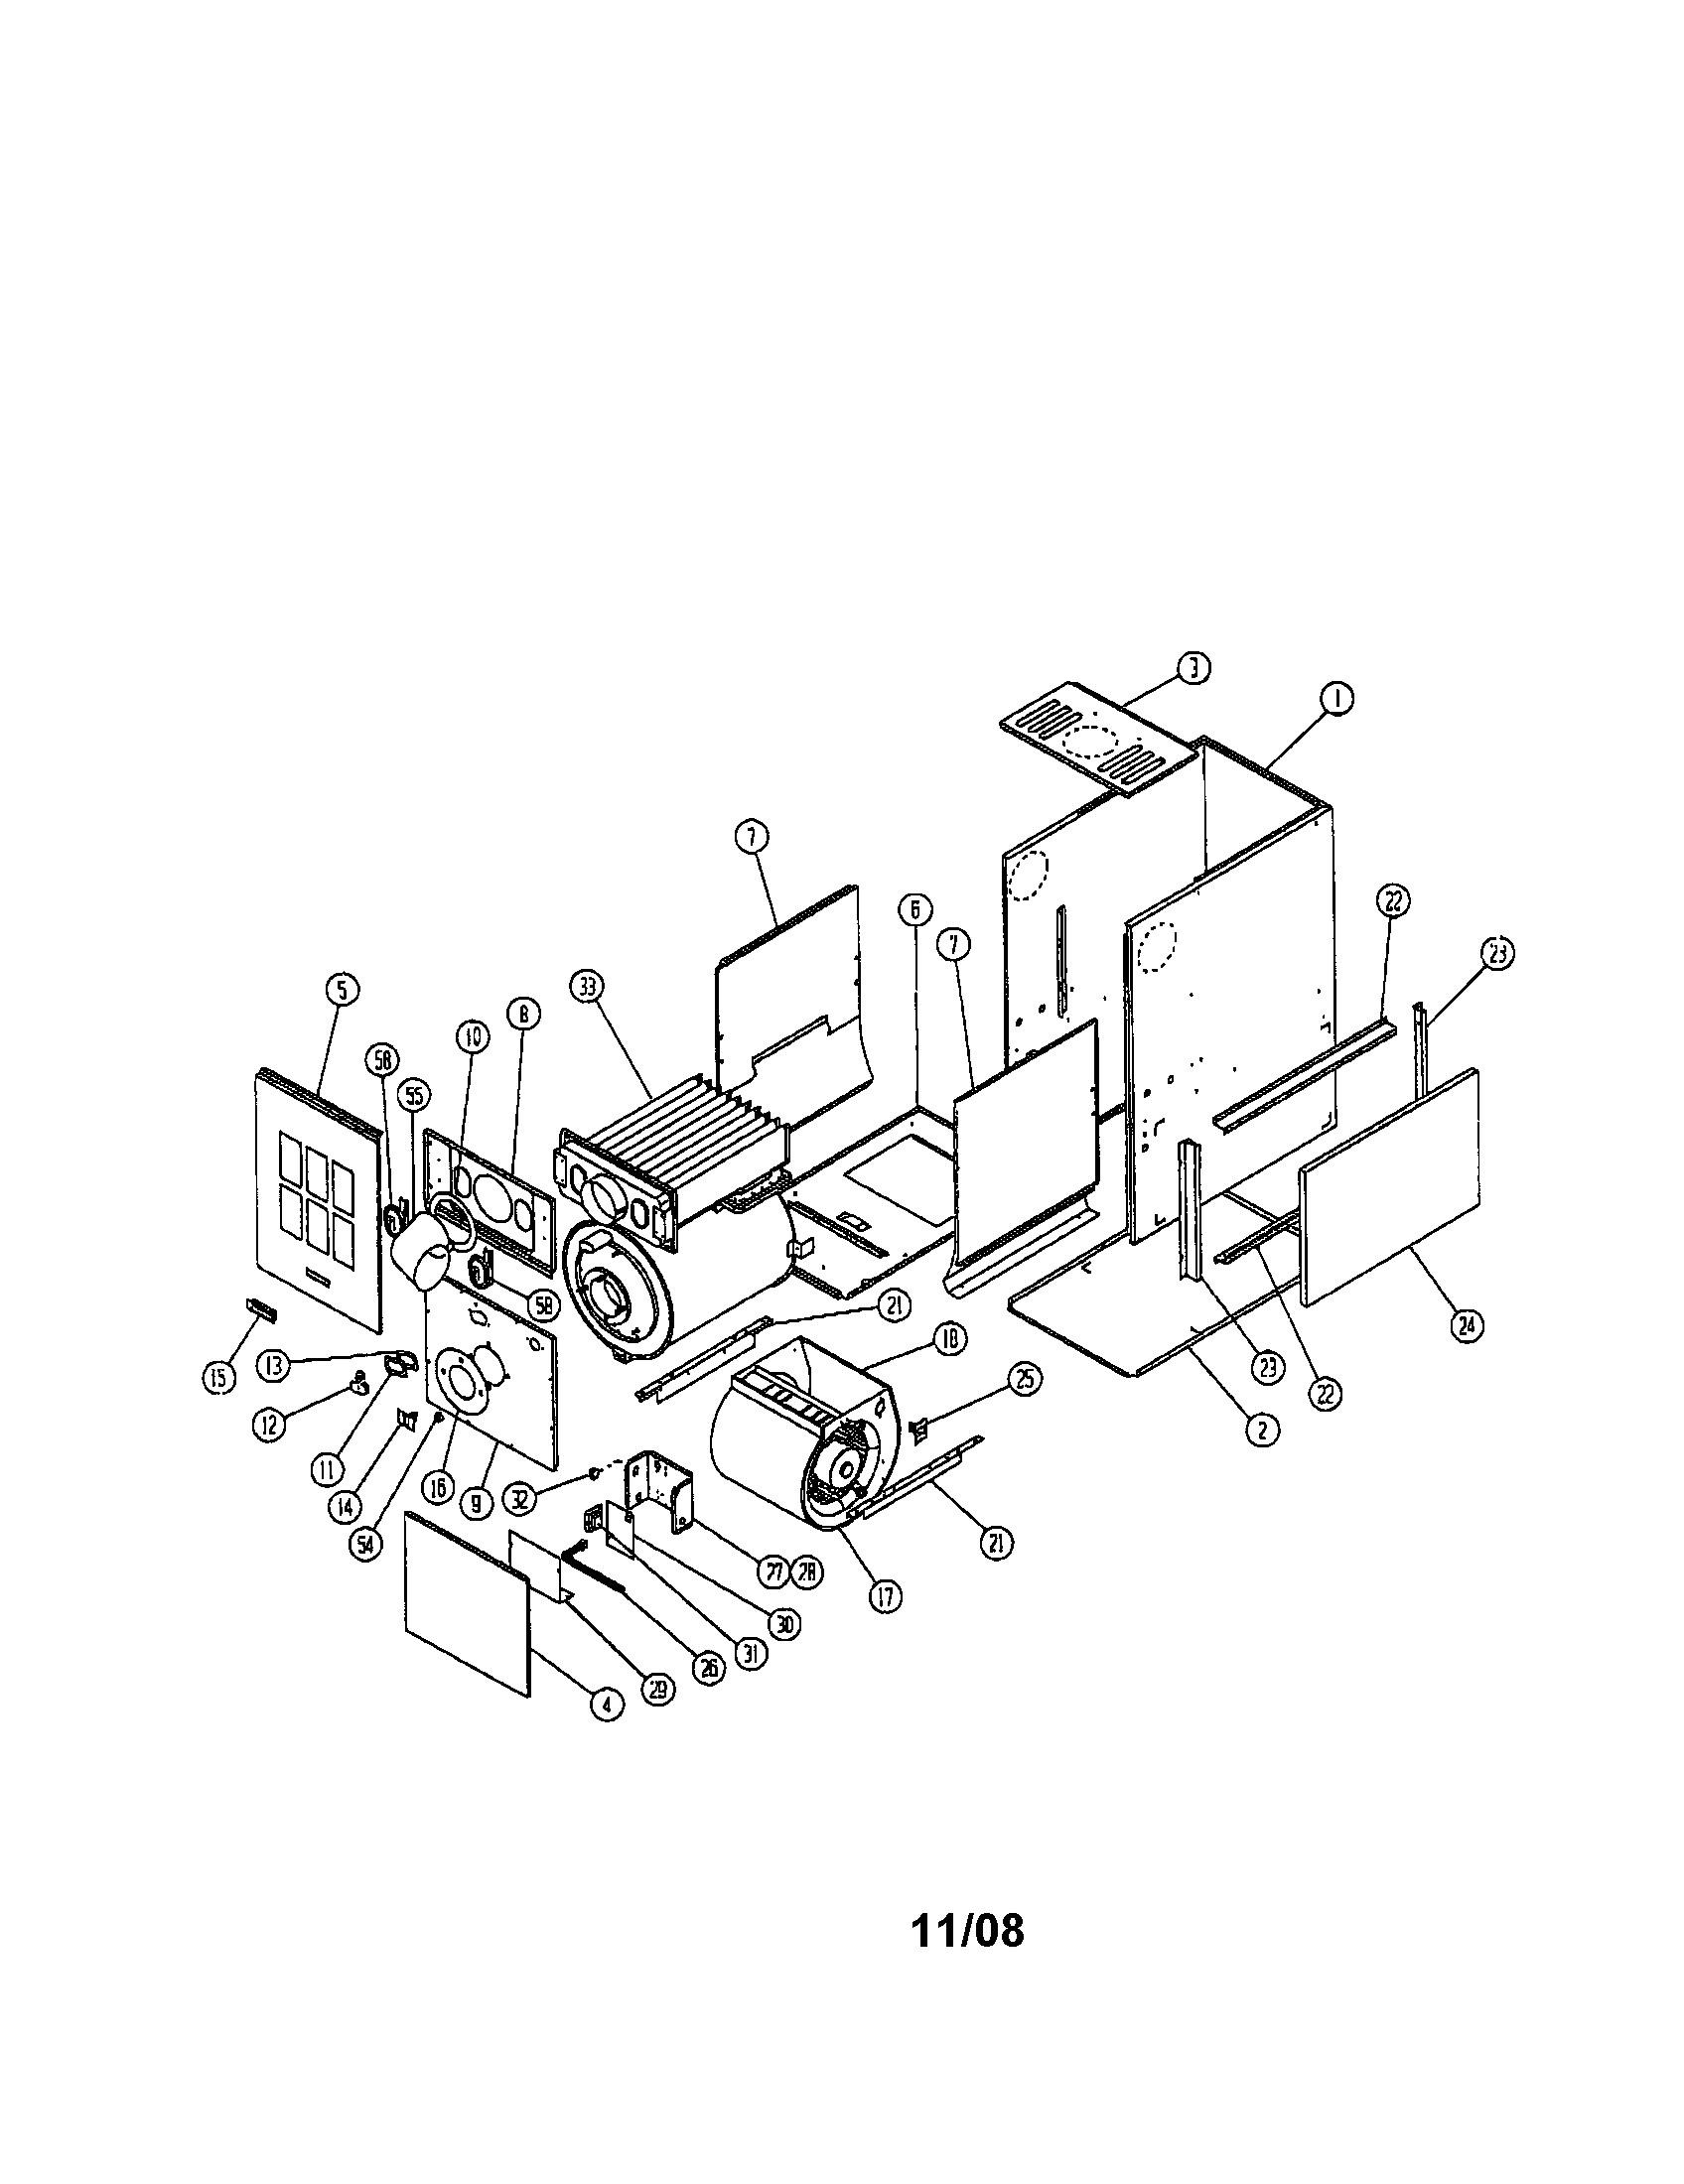 Beckett burner parts diagram ducane upflow horizontal oil furnace 1 3 hp parts of beckett burner